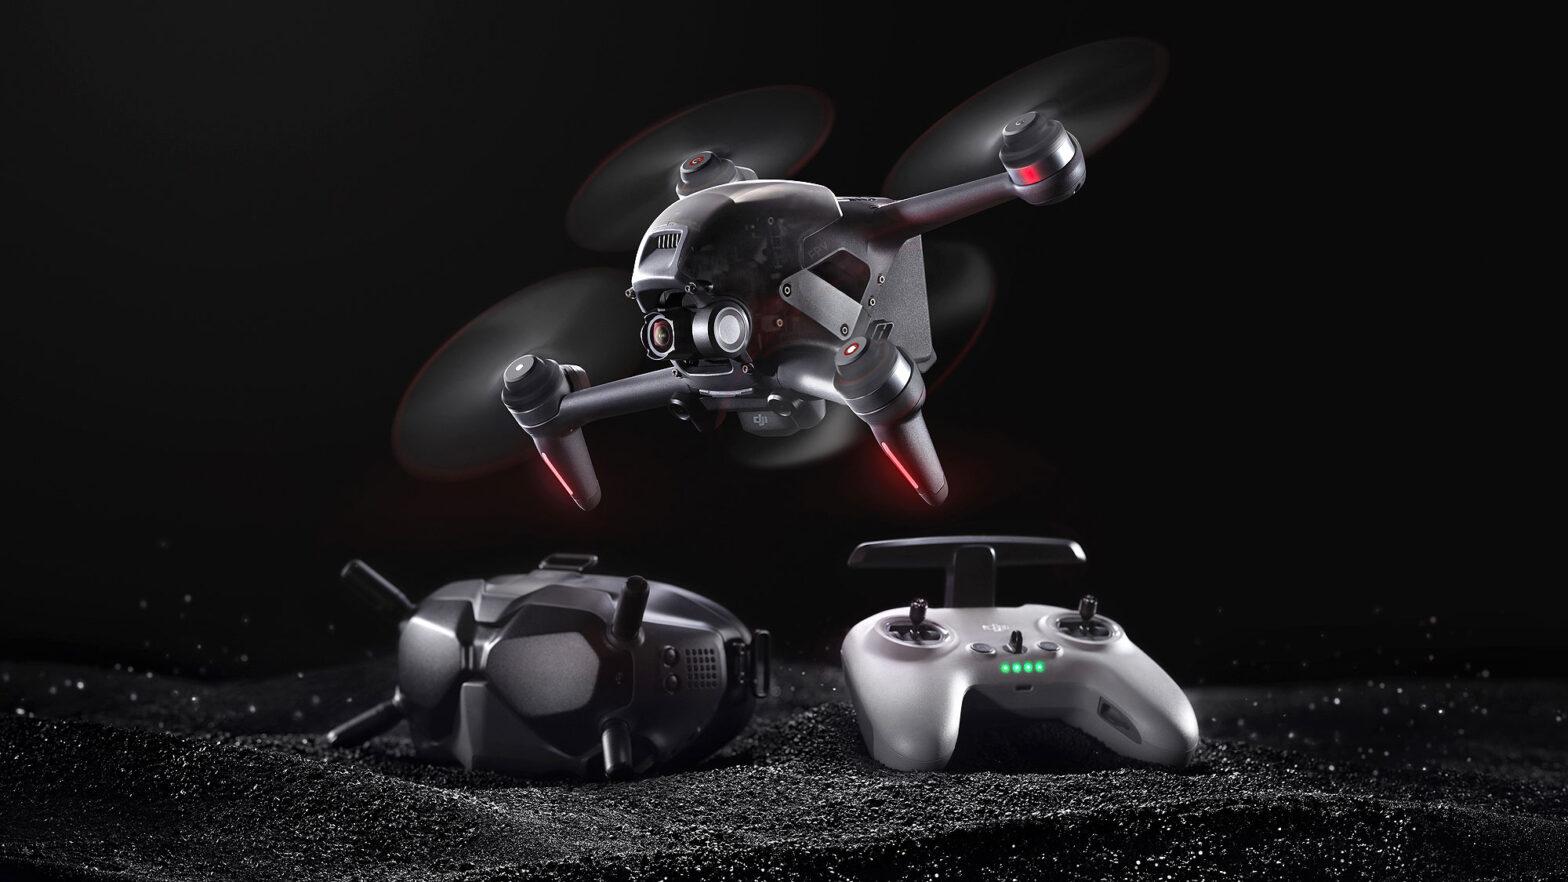 DJI FPV Imaging Drone and FPV Drone Hybrid